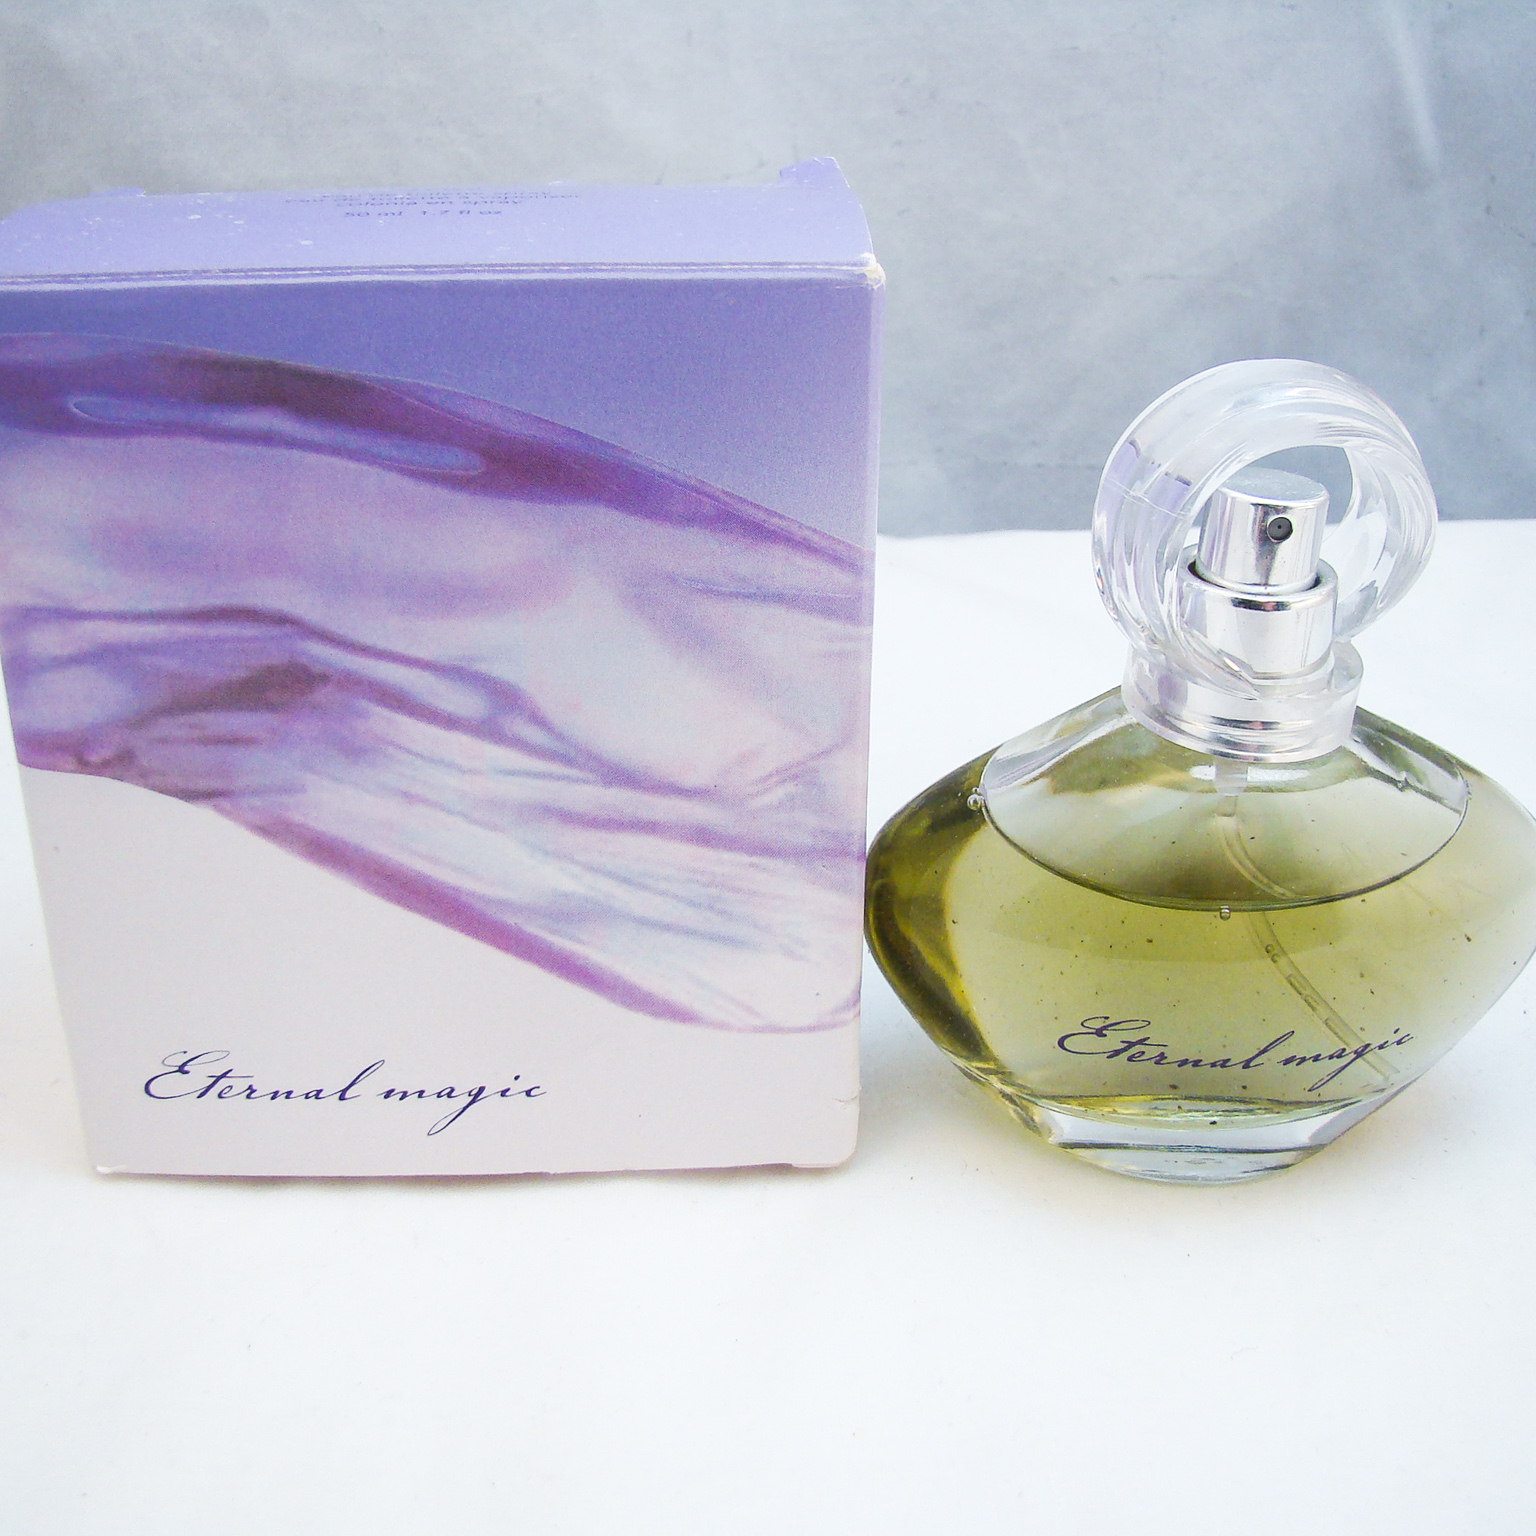 Avon Eternal Magic Eau De Toilette Spray 17 Oz 50 Ml Missing Drop